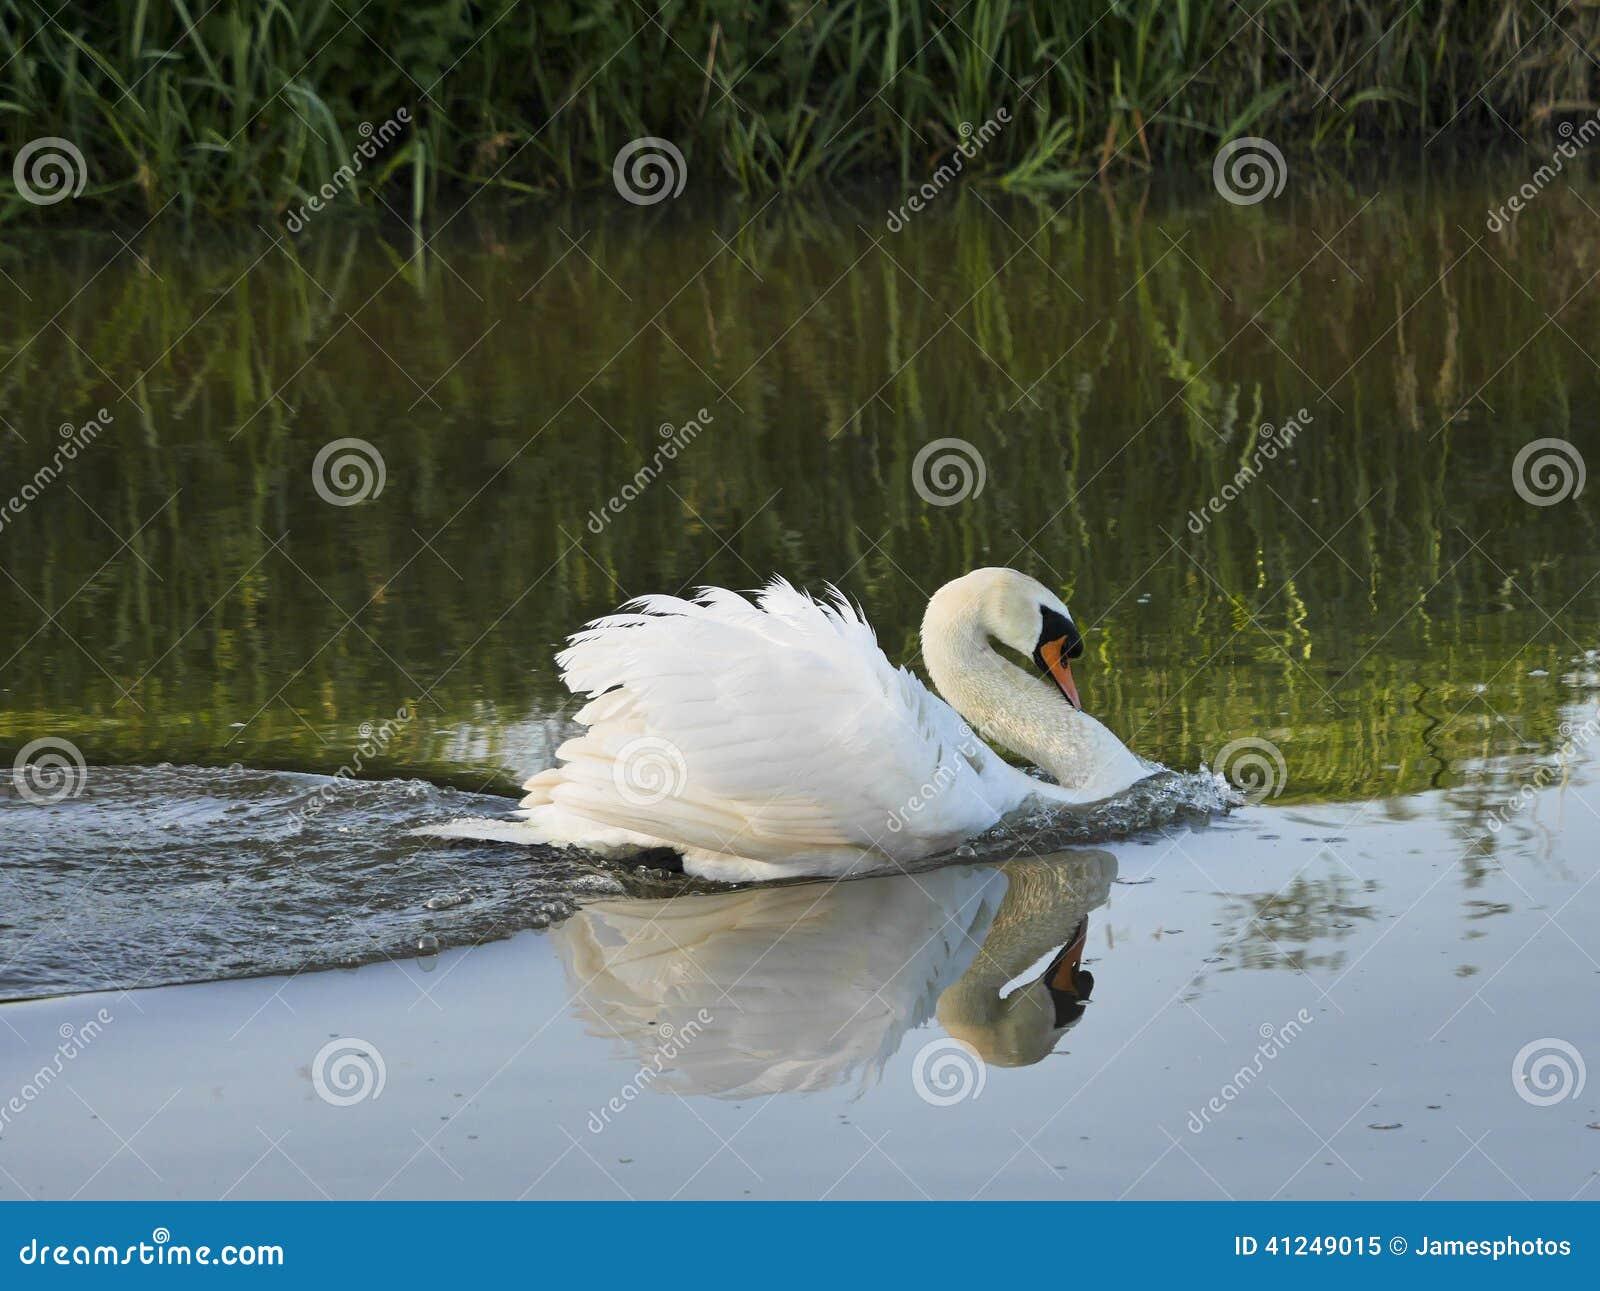 swan river single men Meet single men in swan river mb online & chat in the forums dhu is a 100% free dating site to find single men in swan river.